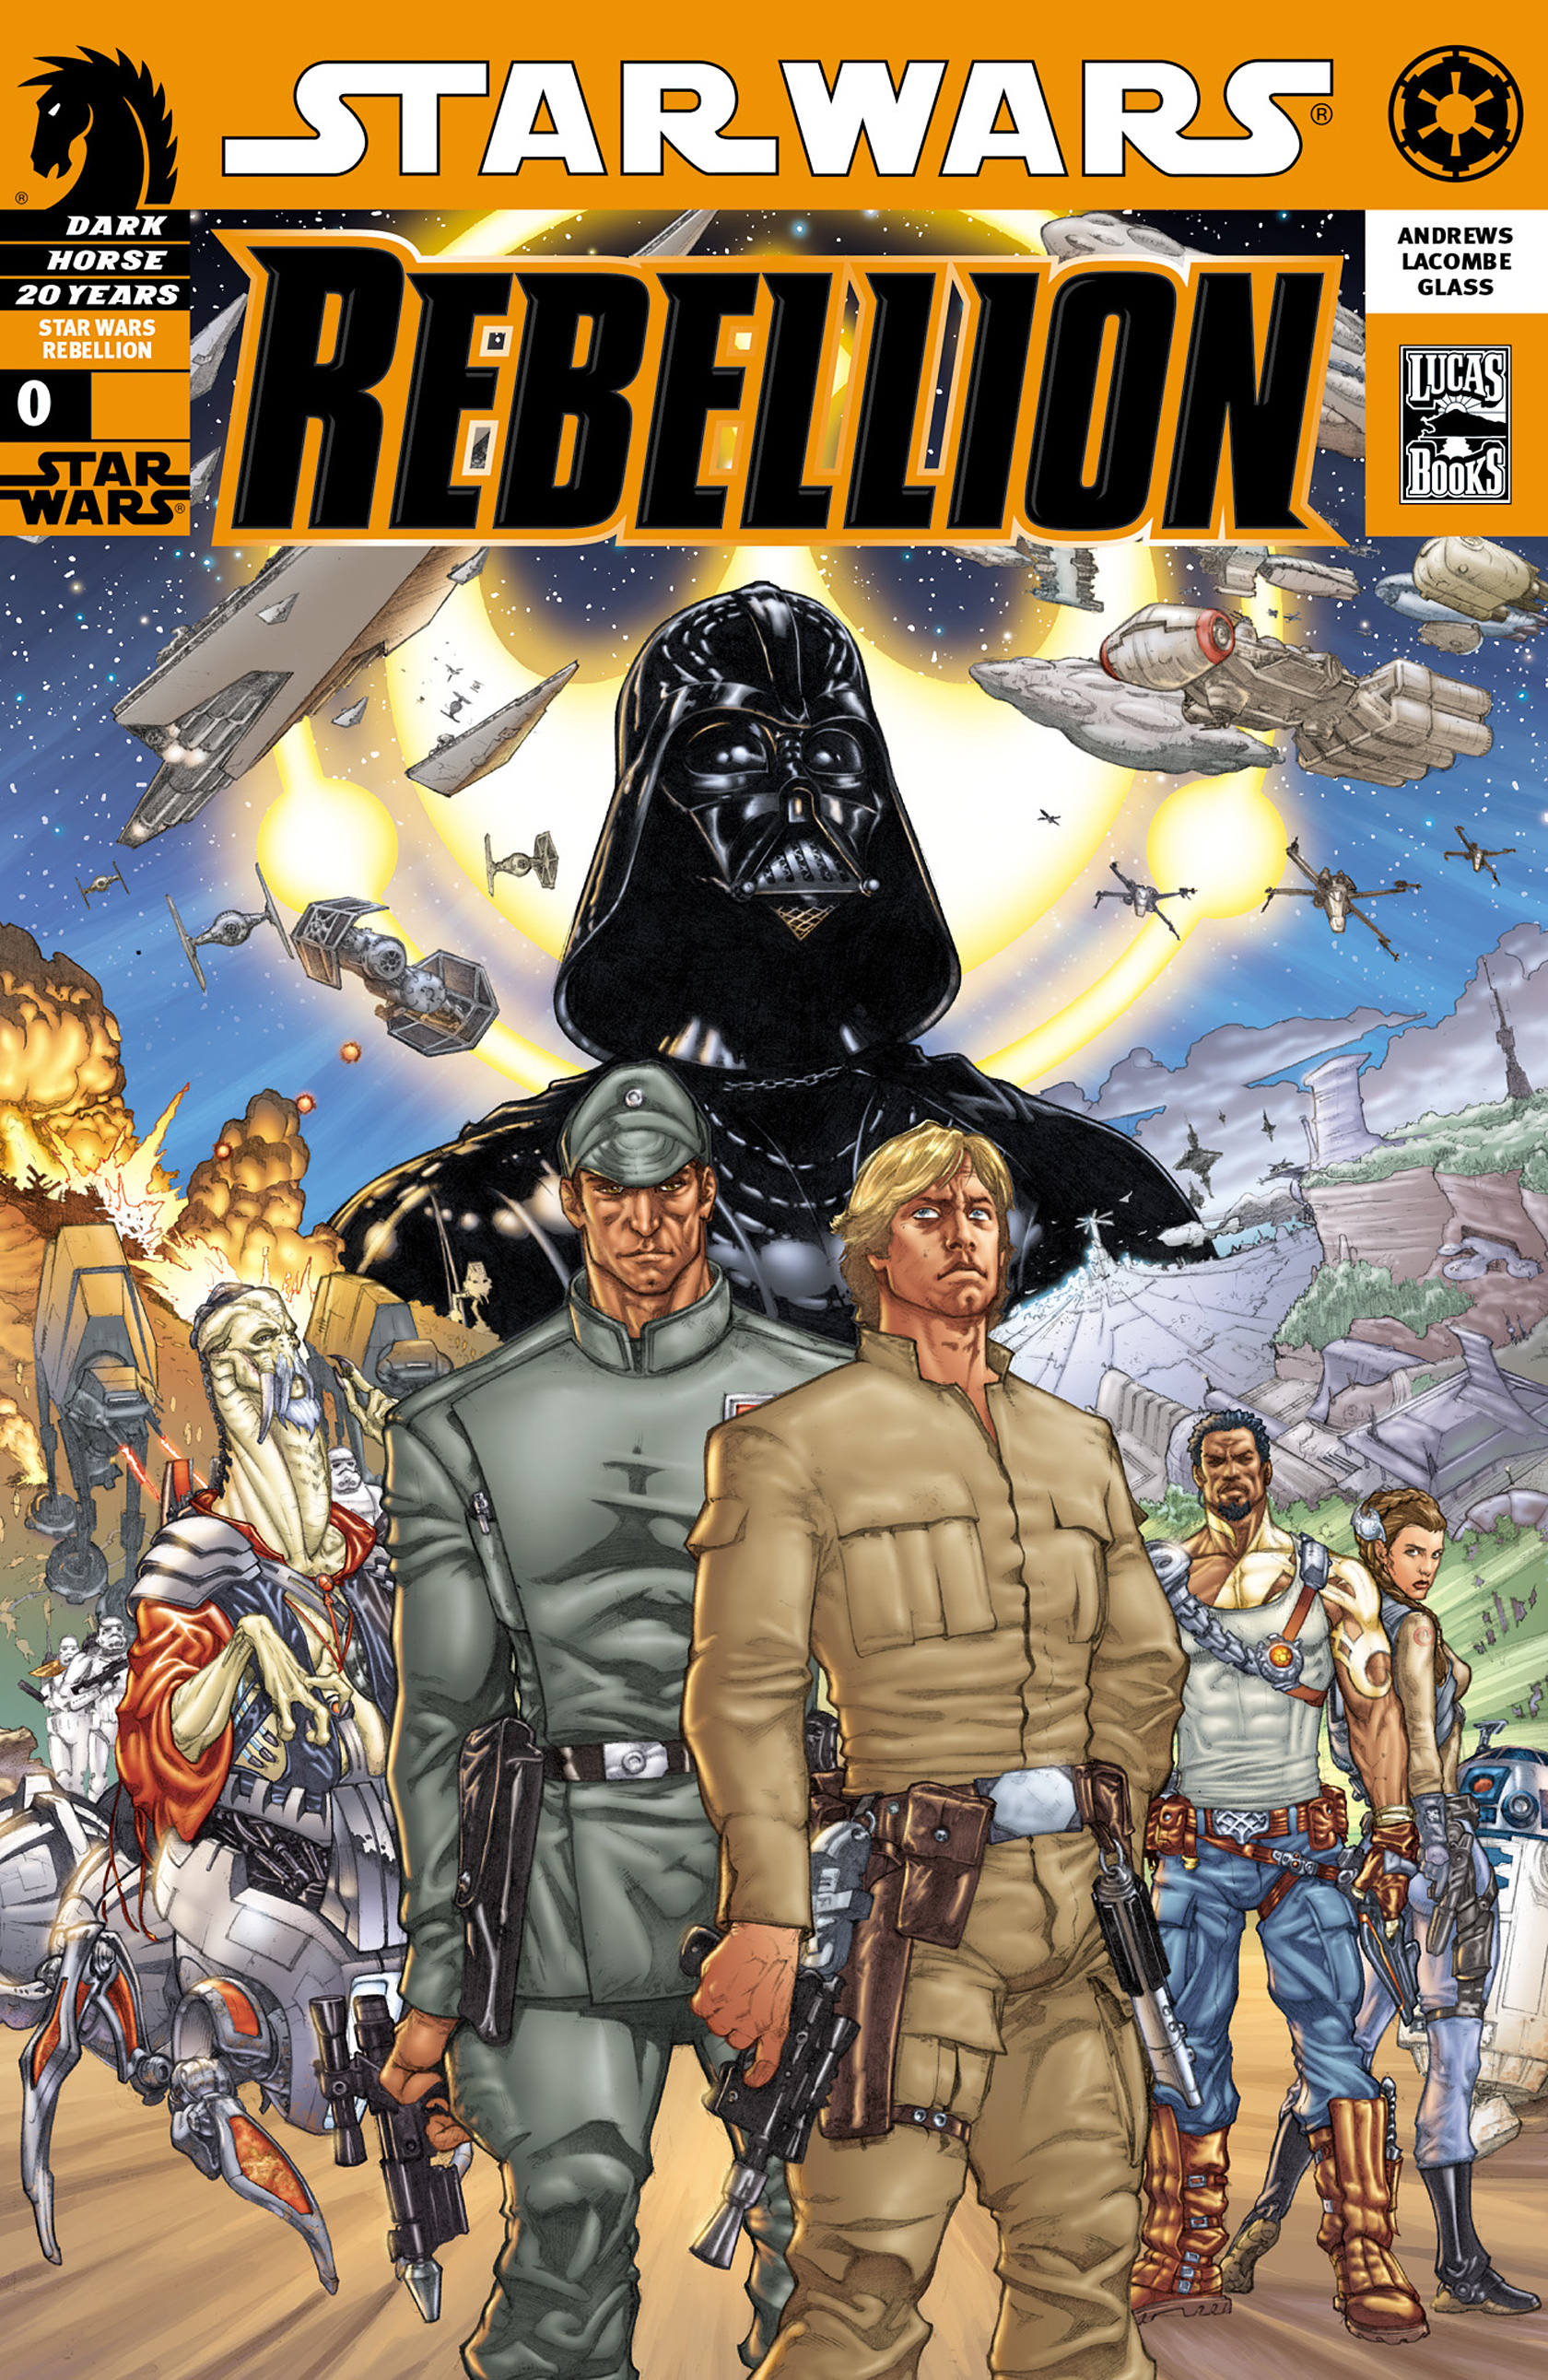 Star Wars: Rebellion 0 Page 1